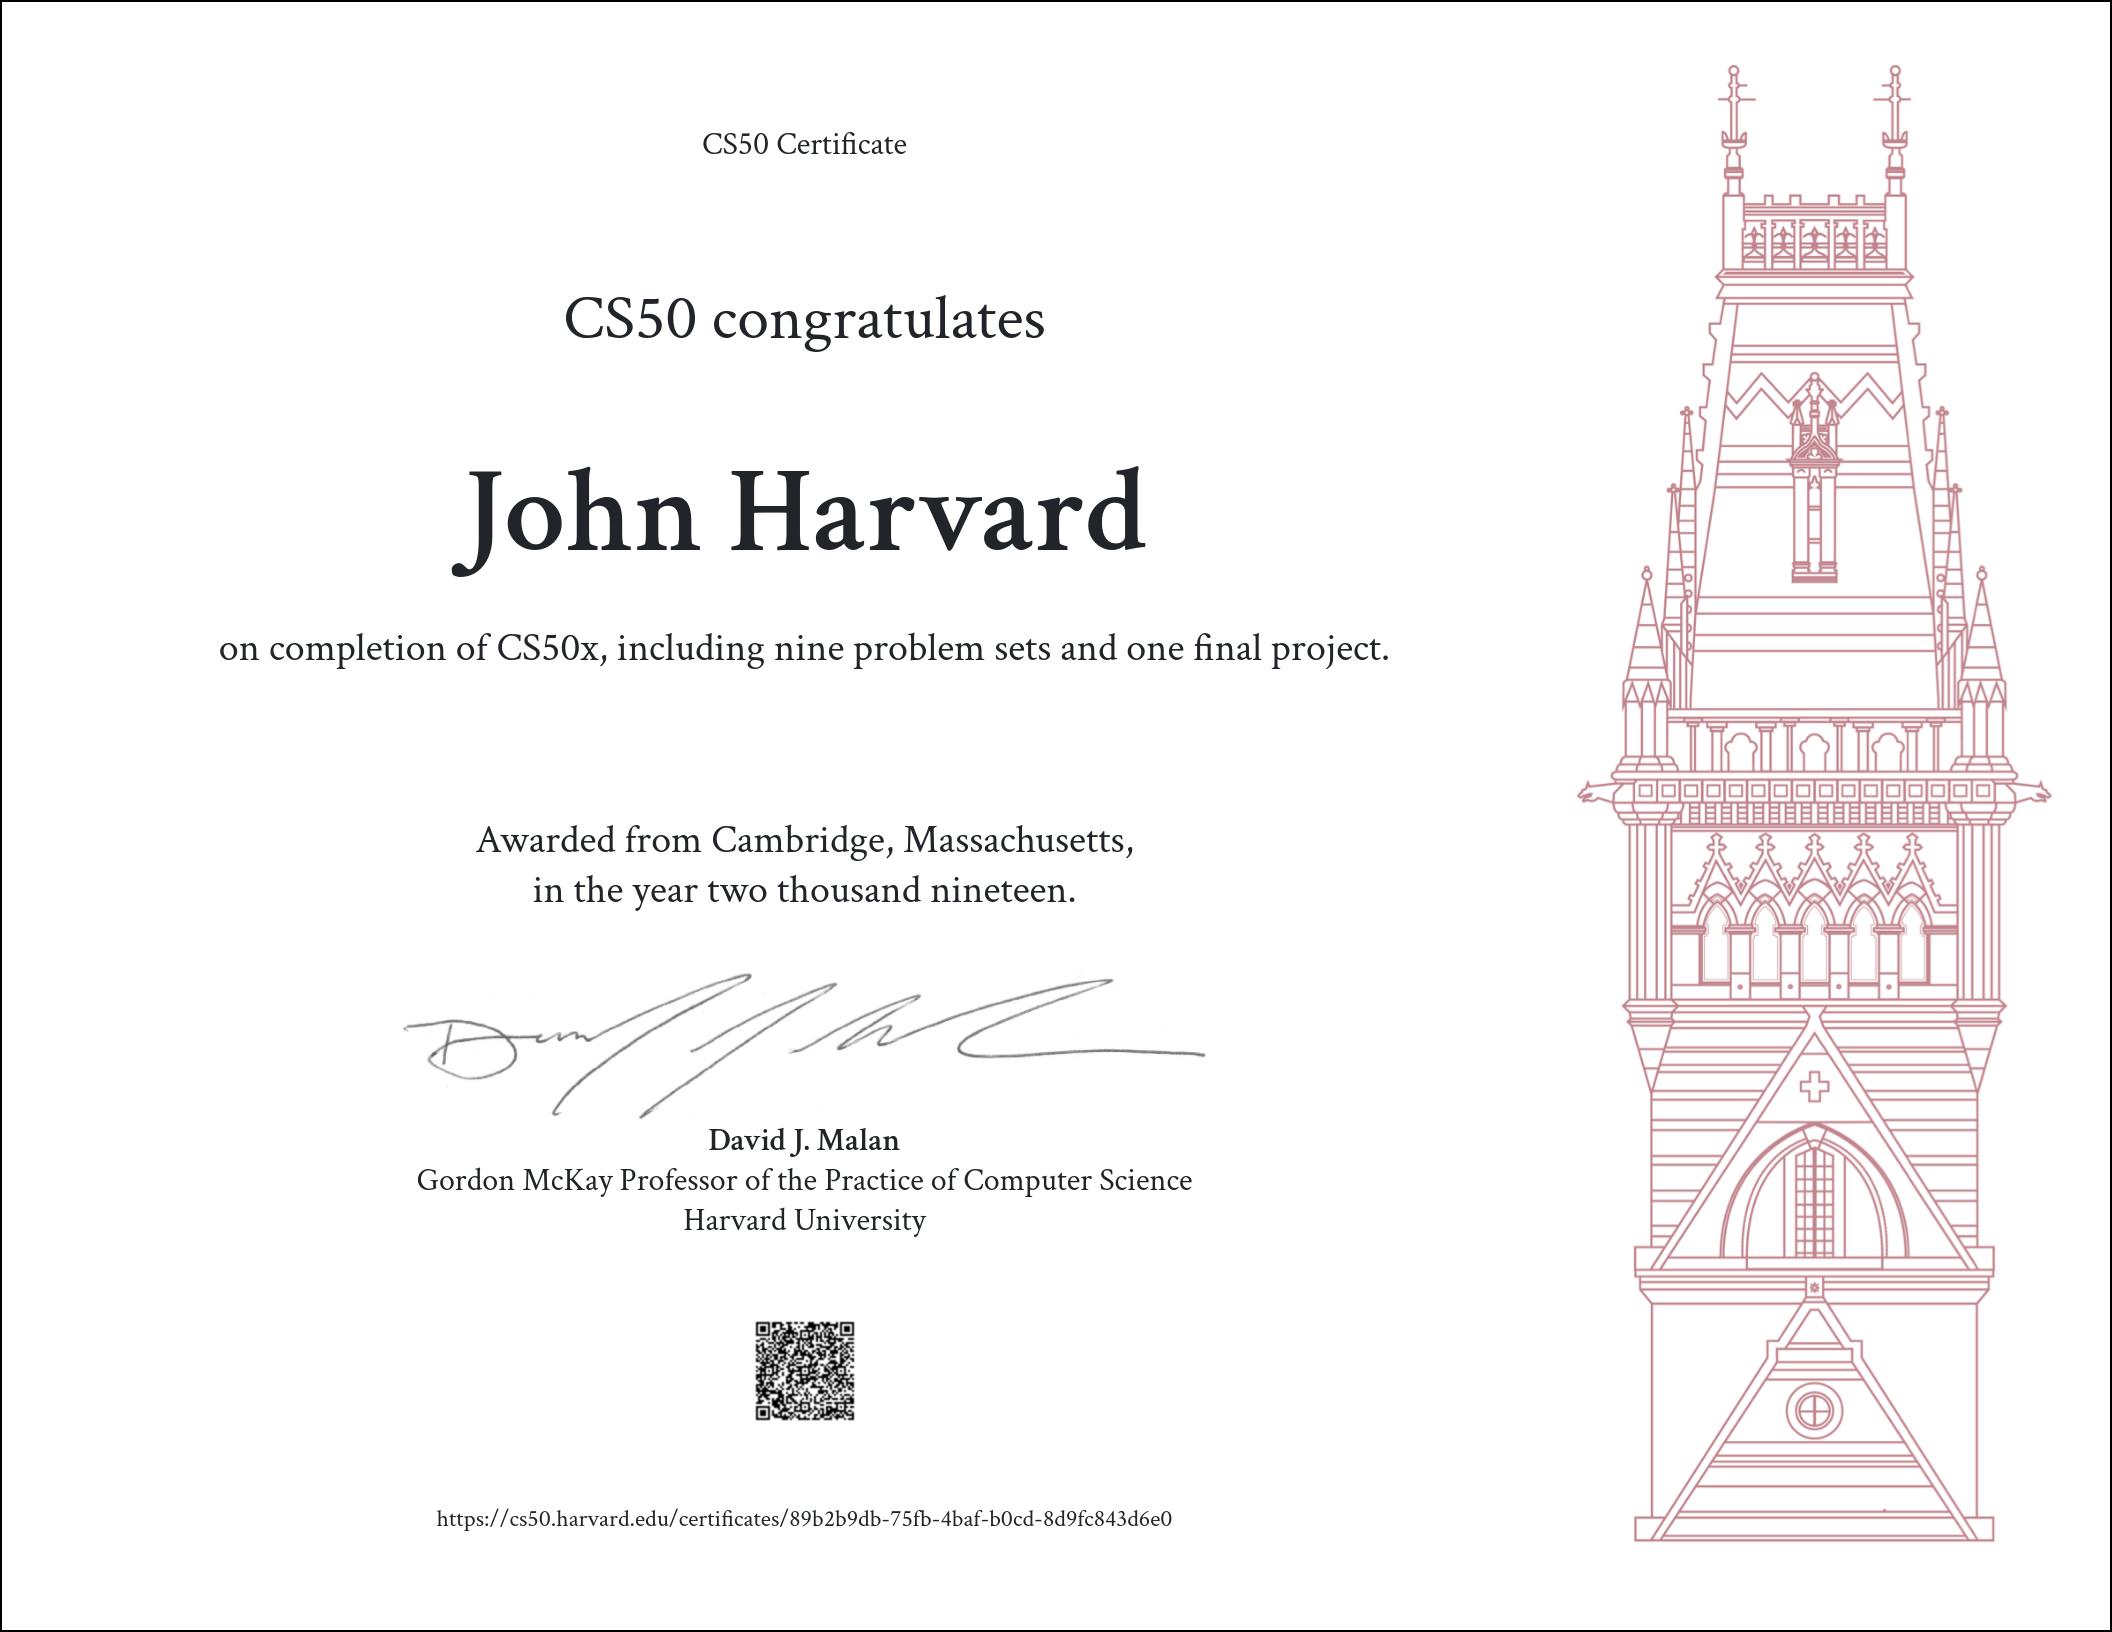 CS50 Certificate